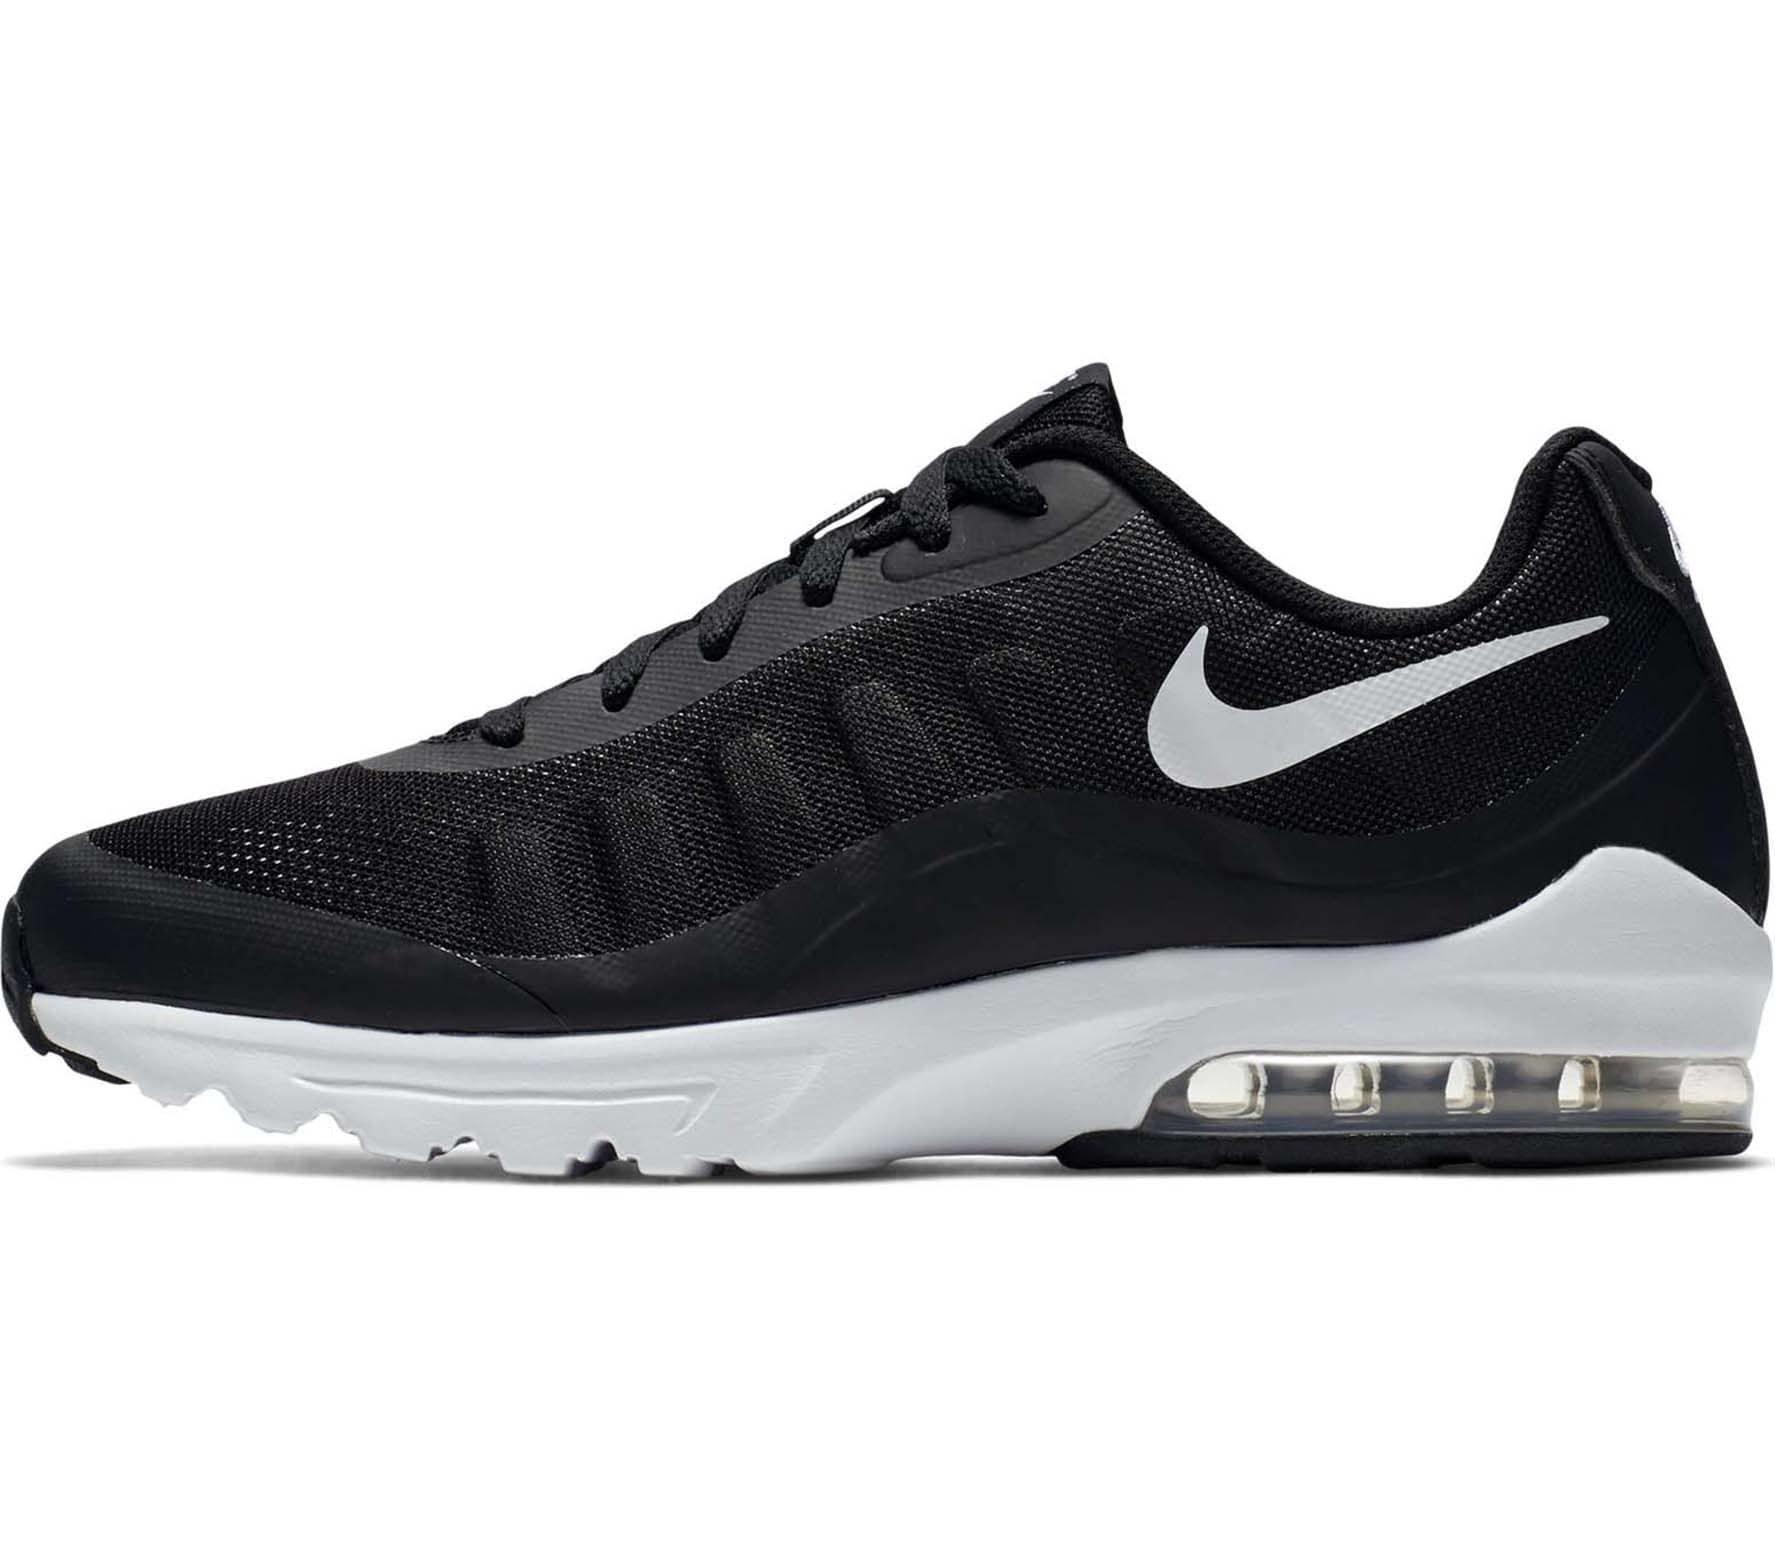 9e68318c27e Nike Air Max Invigor | Nike Air Max Invigor sale | Sneakers4u